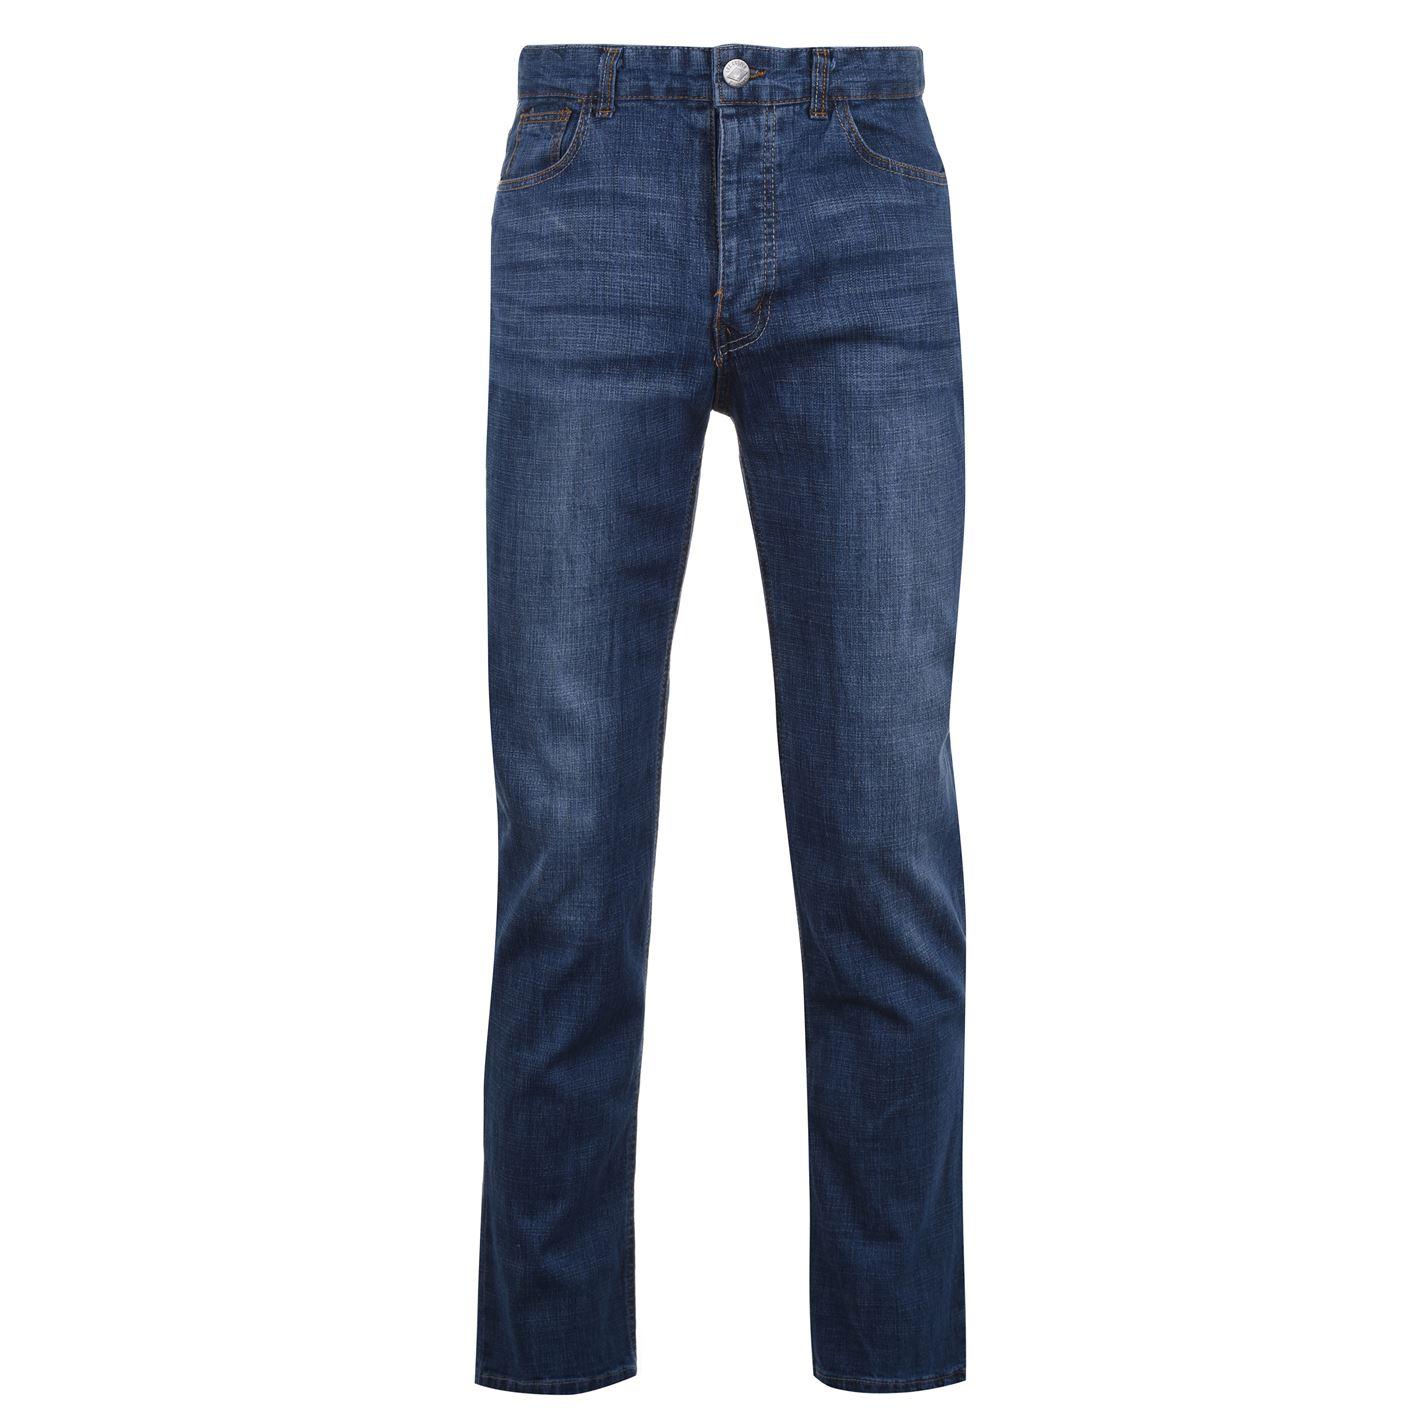 Lee Cooper Denim Jeans Mens